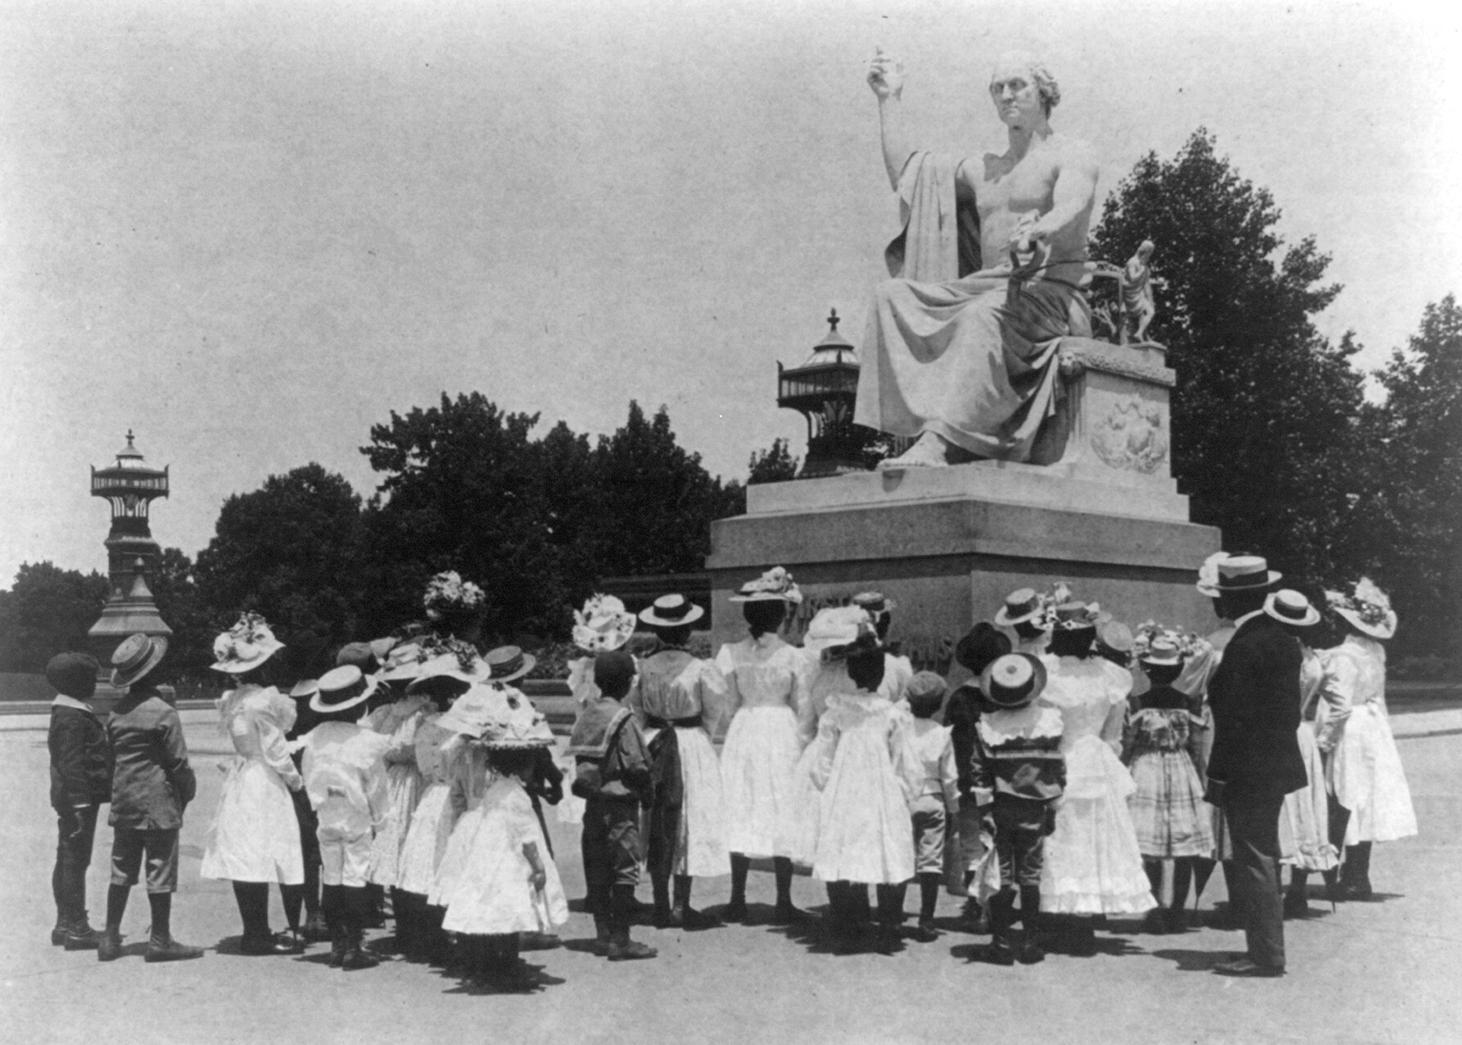 http://upload.wikimedia.org/wikipedia/commons/b/ba/Horatio_Greenough_statue_of_George_Washington.jpg